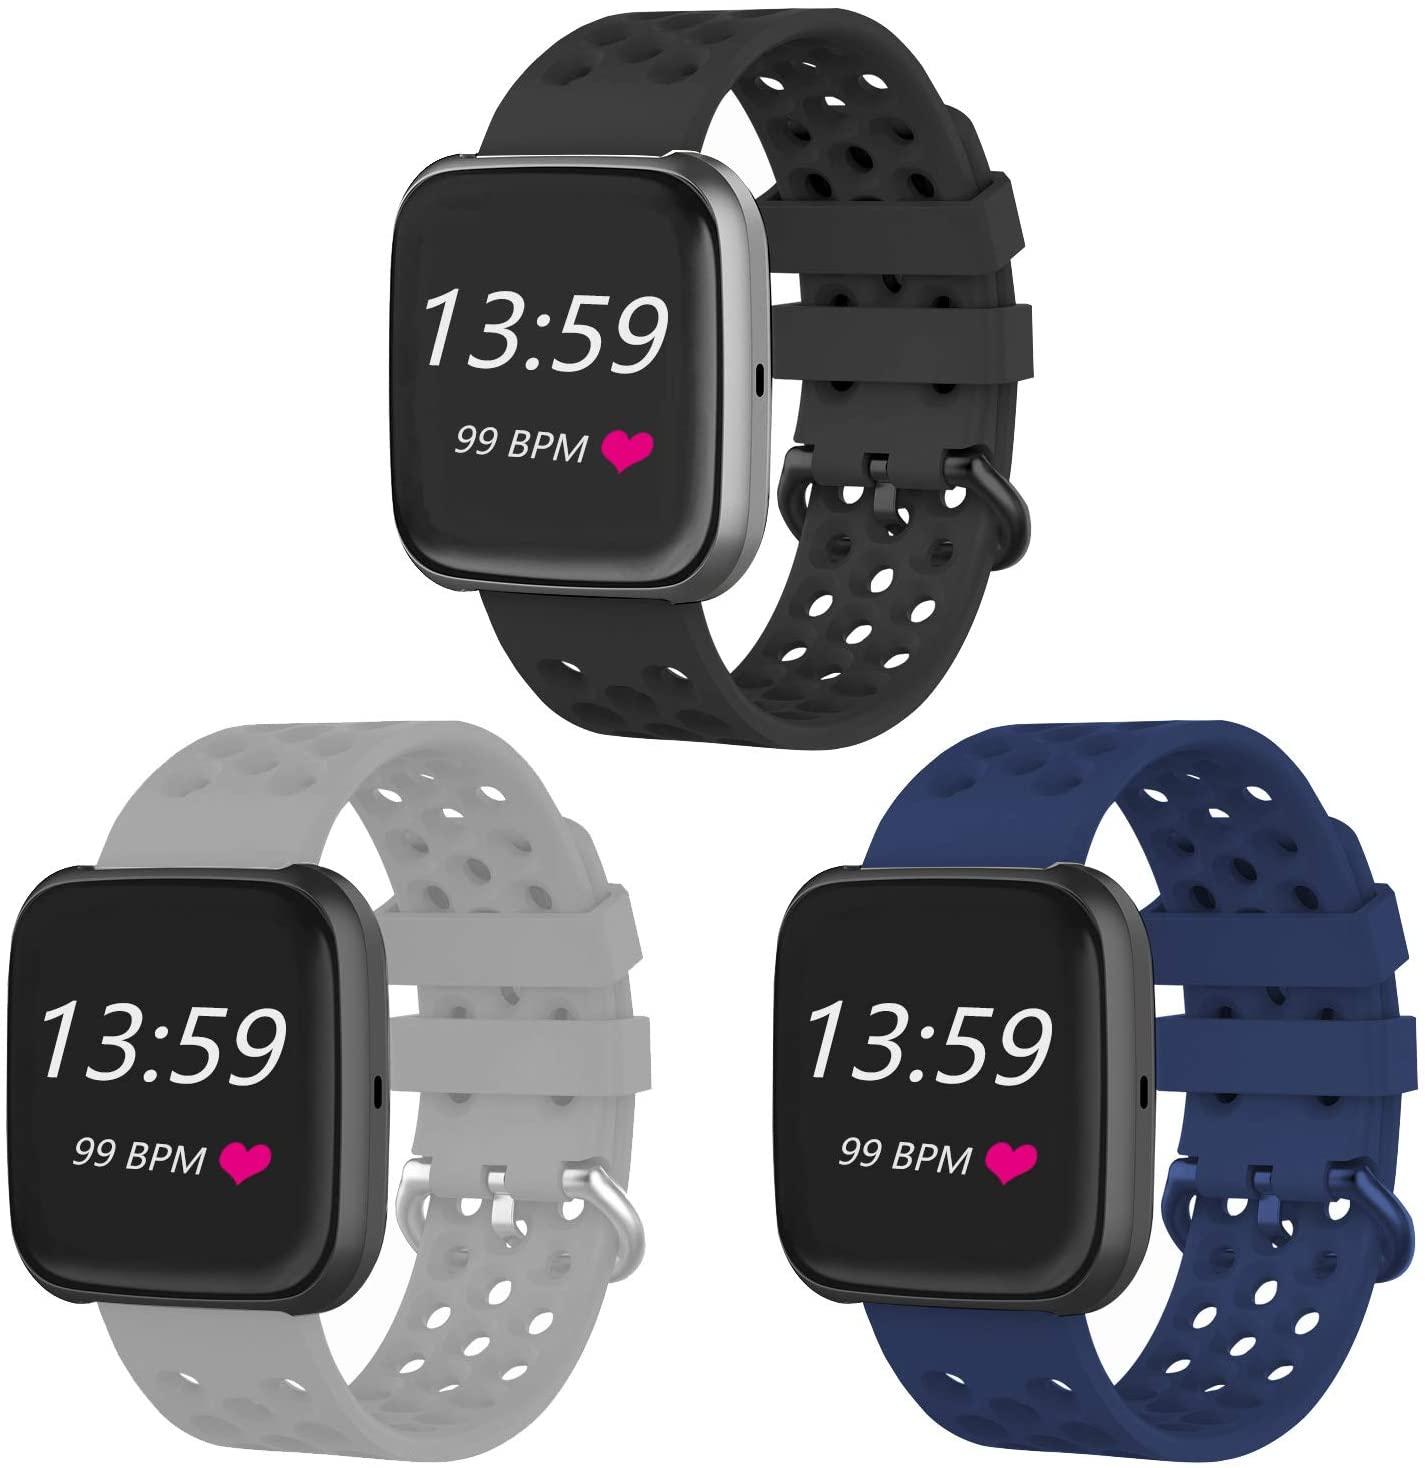 VINIKI 3Pcs Sport Bands Compatible with Fitbit Versa/Versa 2/Versa Lite/SE Special Edition Adjustable Sport Wristbands (Black,Grey,Dark Blue/Small Size)